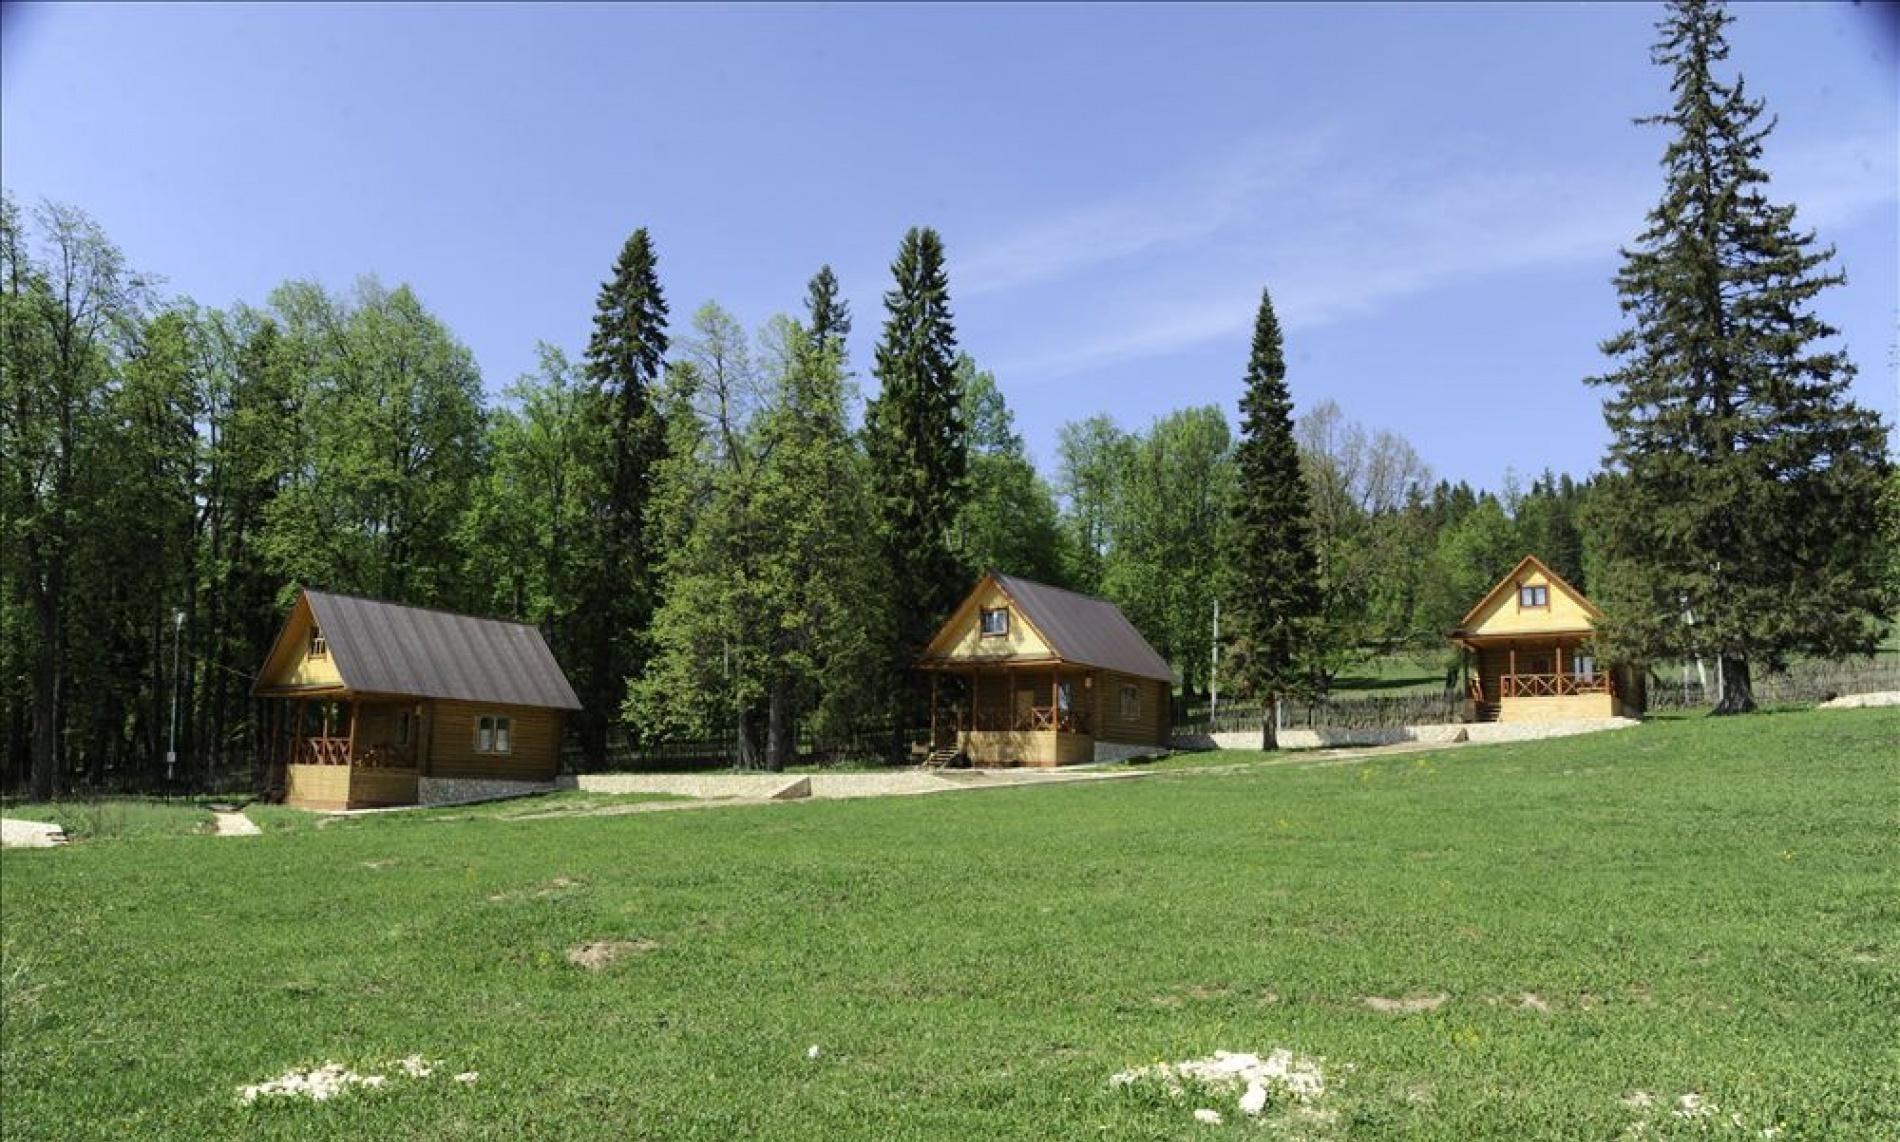 База отдыха «Сказка» Республика Башкортостан, фото 7